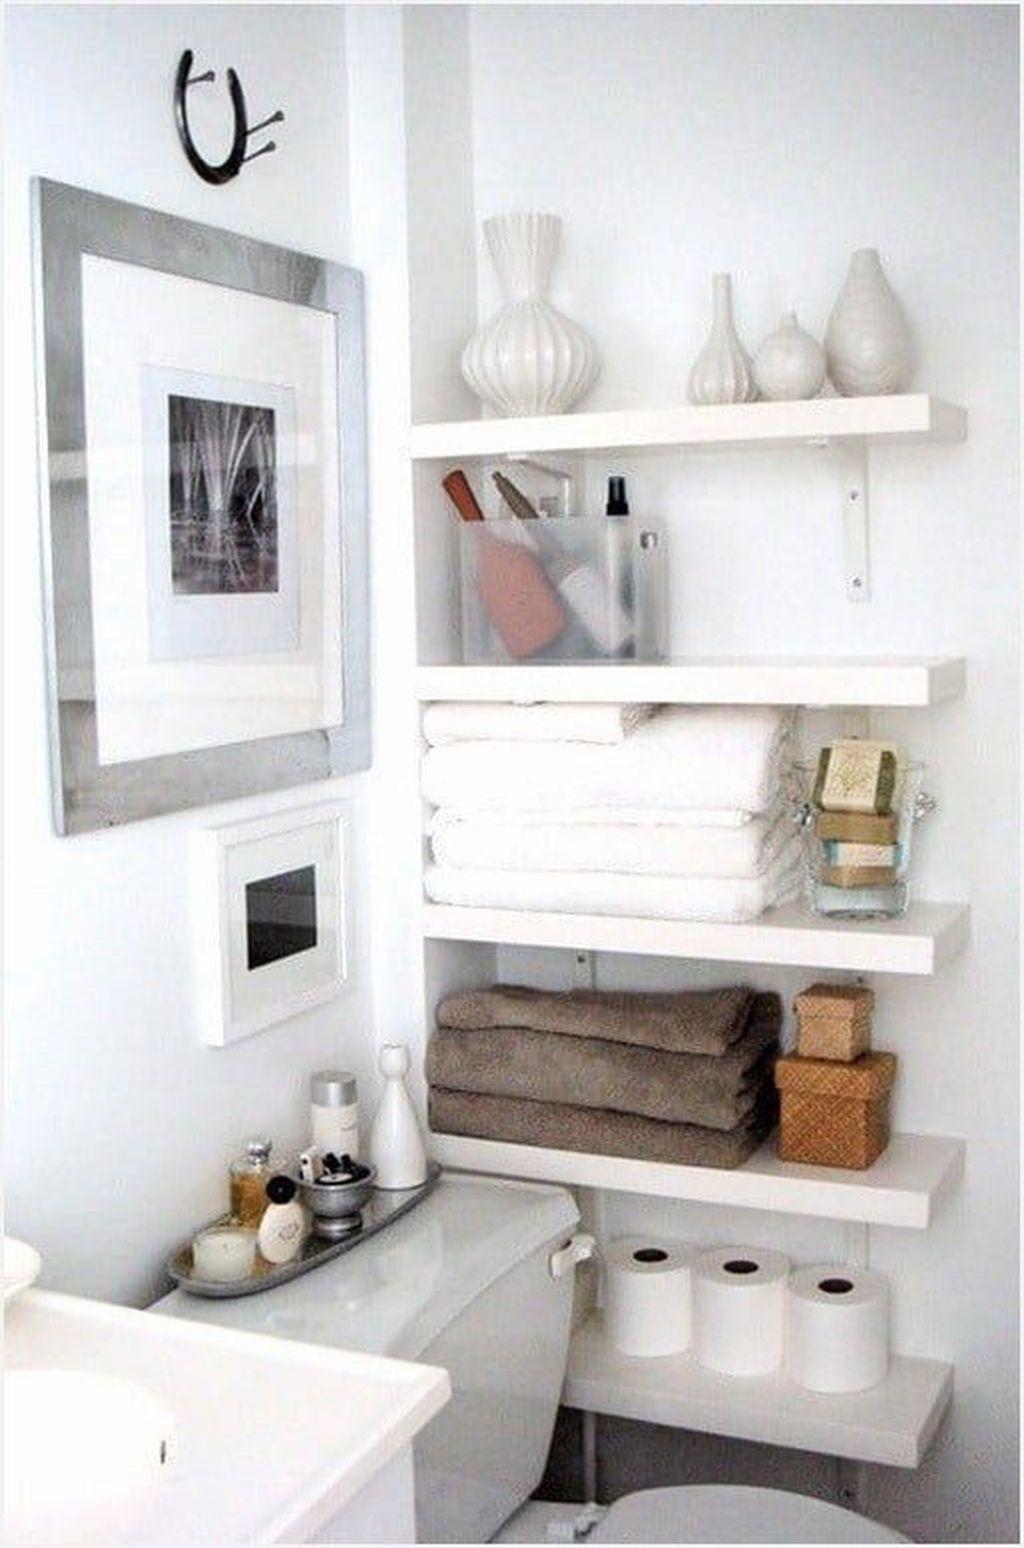 30 Stunning Bathroom Storage Shelves Organization Ideas Coodecor Bathroom Storage Solutions Diy Bathroom Storage Home Decor